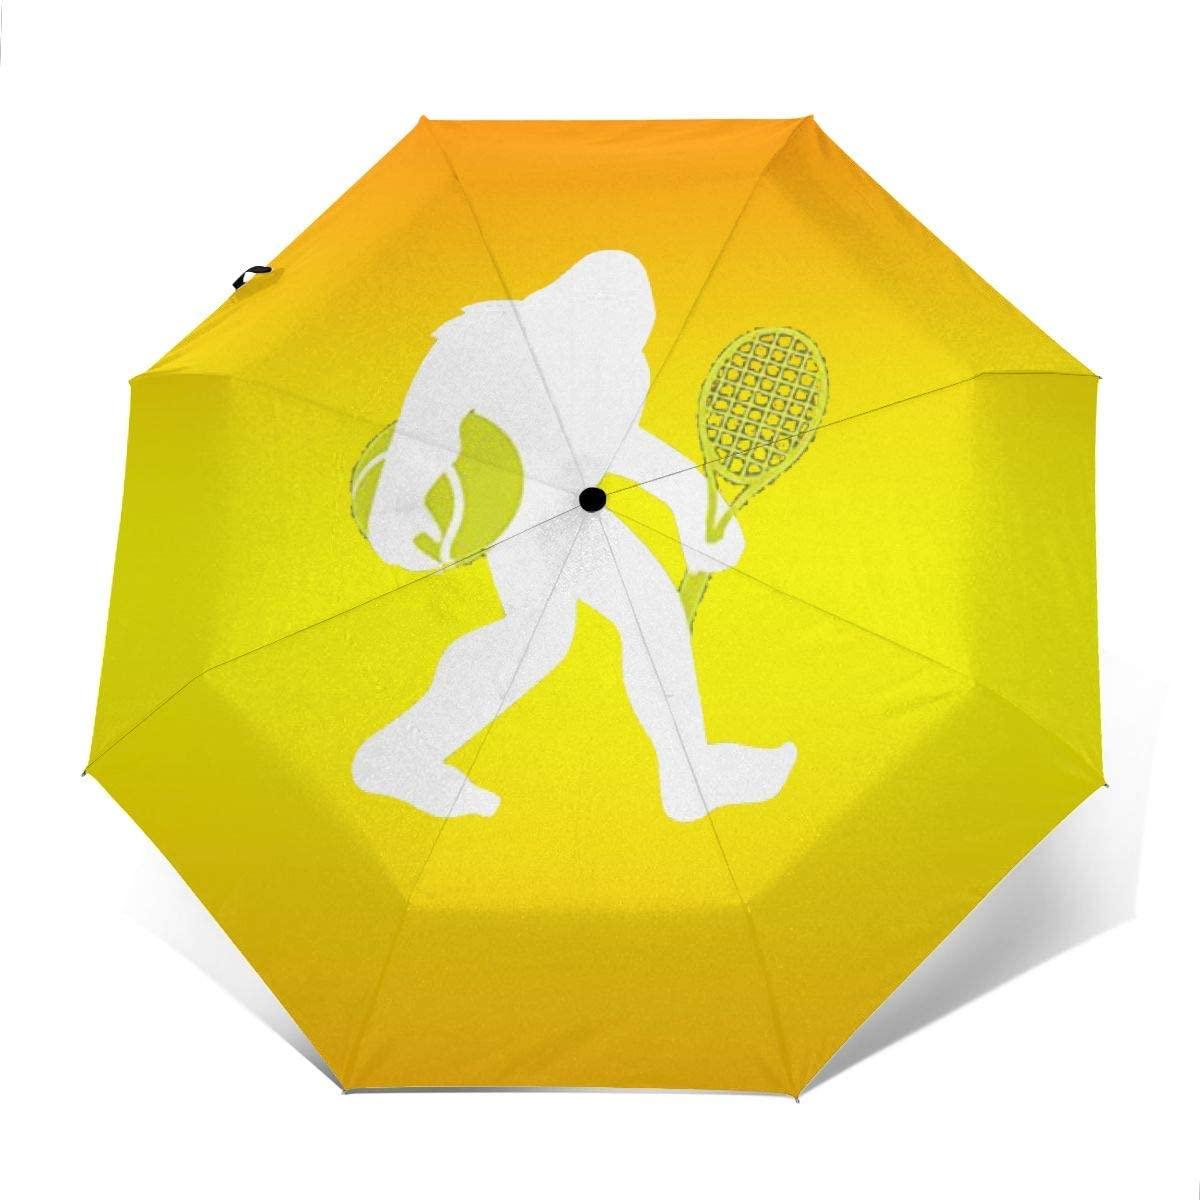 Speed FQ Bigfoot Carrying Tennis Folding Umbrella Travel Fashion Automatic Umbrella